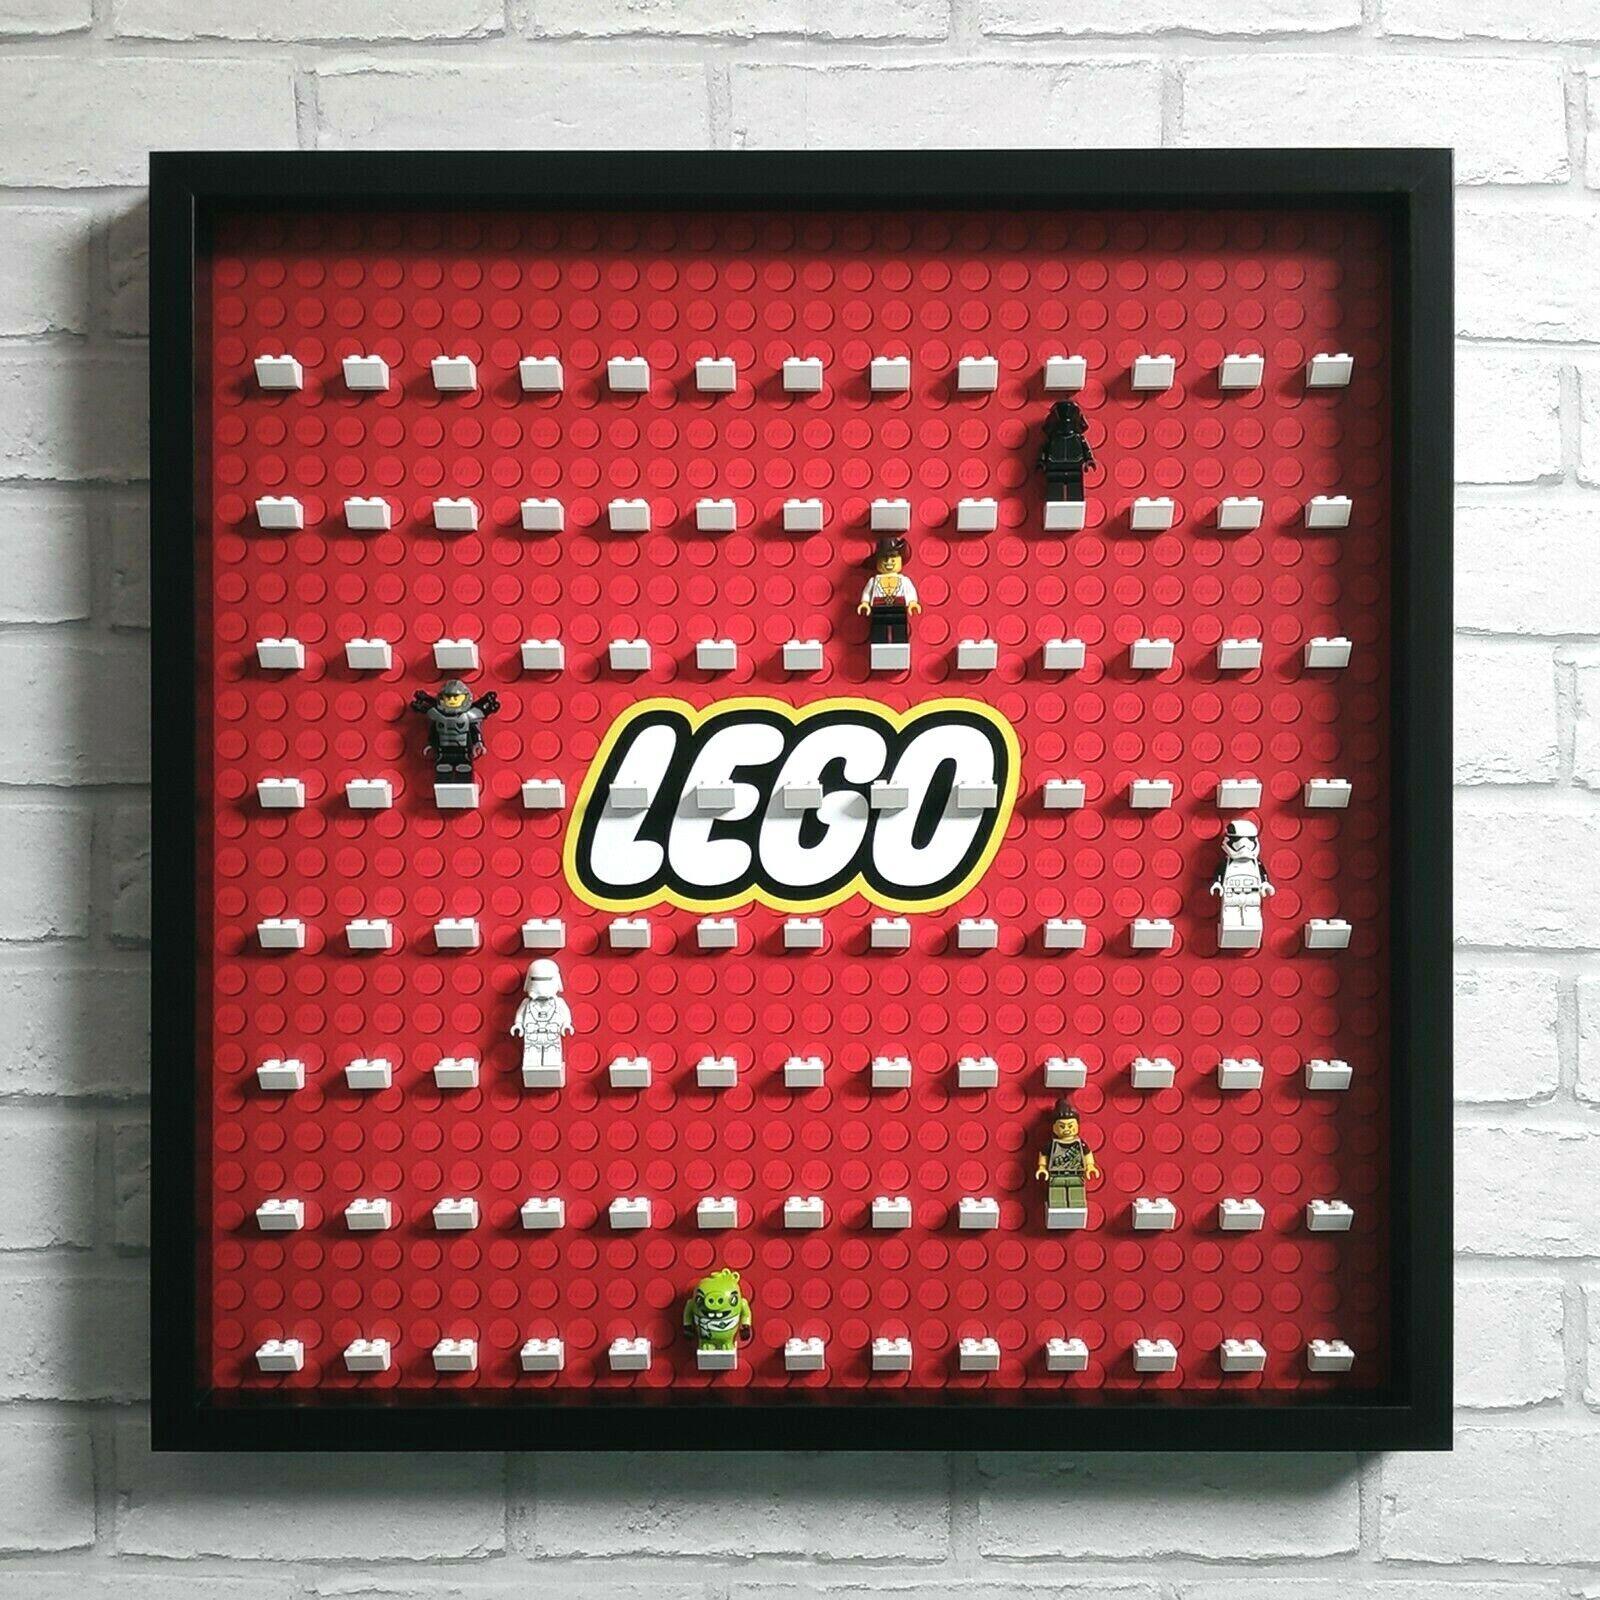 LEGO Minifig Visa ramfall stort - passar 104 Minifigs - svart (röd logo)